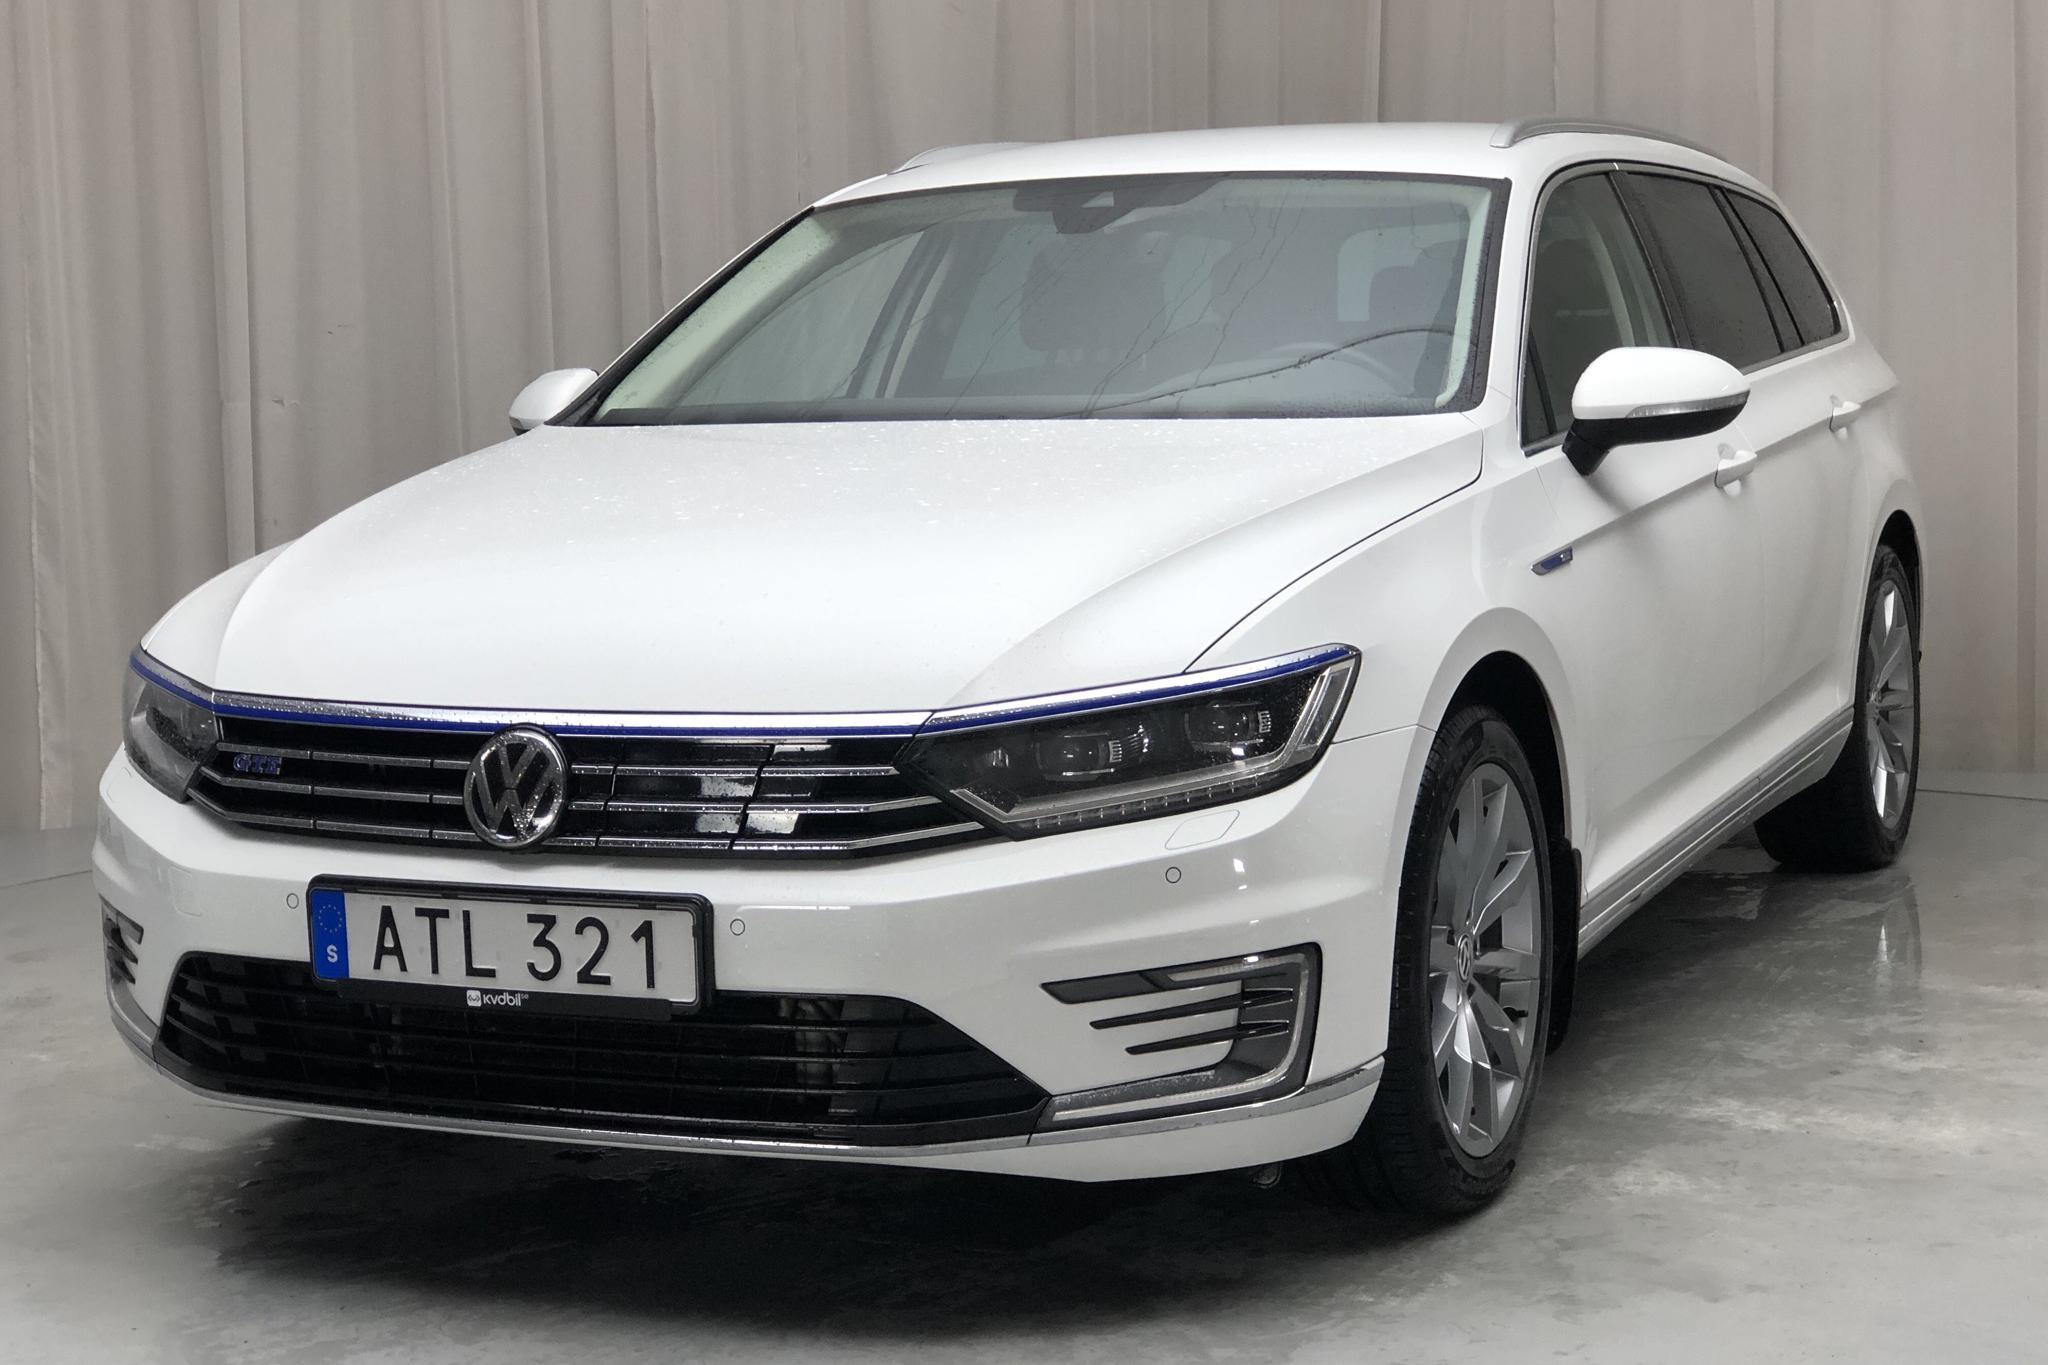 VW Passat 1.4 Plug-in-Hybrid Sportscombi (218hk) - 7 217 mil - Automat - vit - 2018